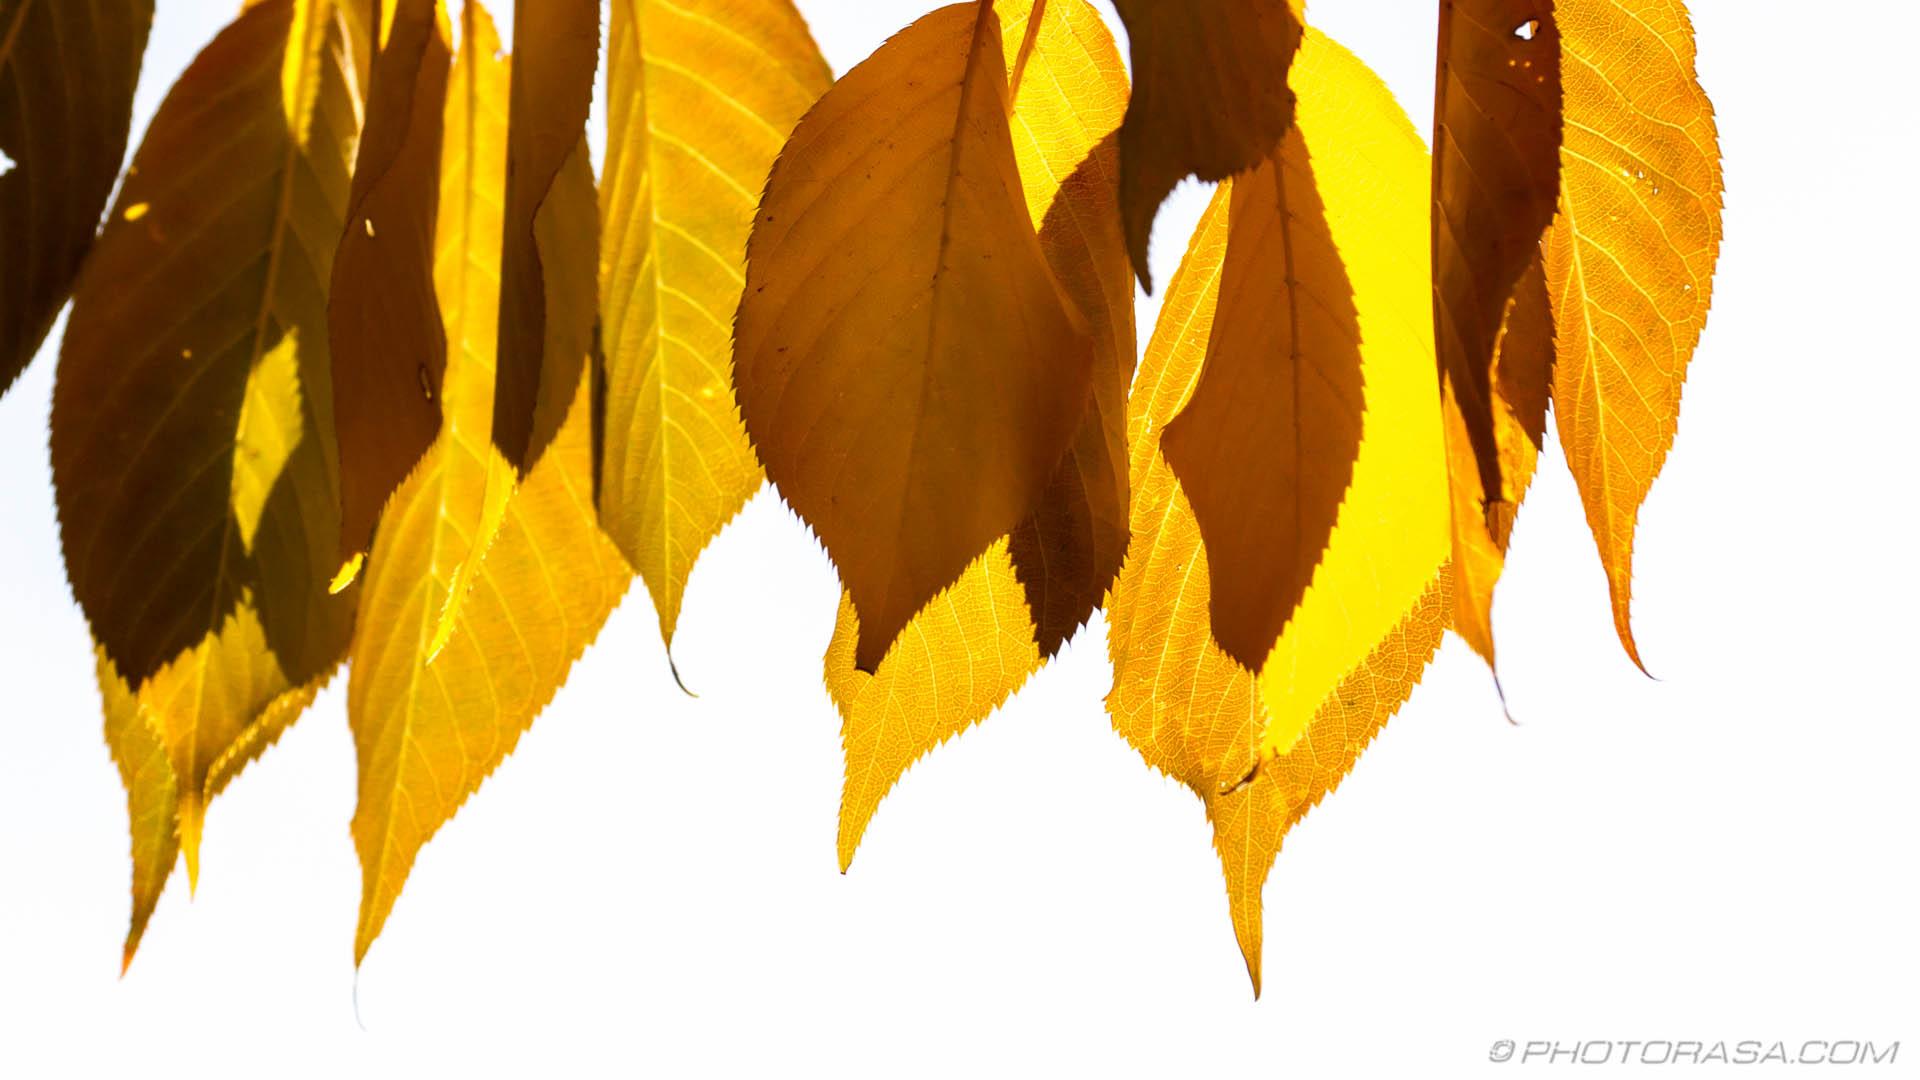 http://photorasa.com/autumn-leaves-sunlight/old-yellow-beech-leaves/